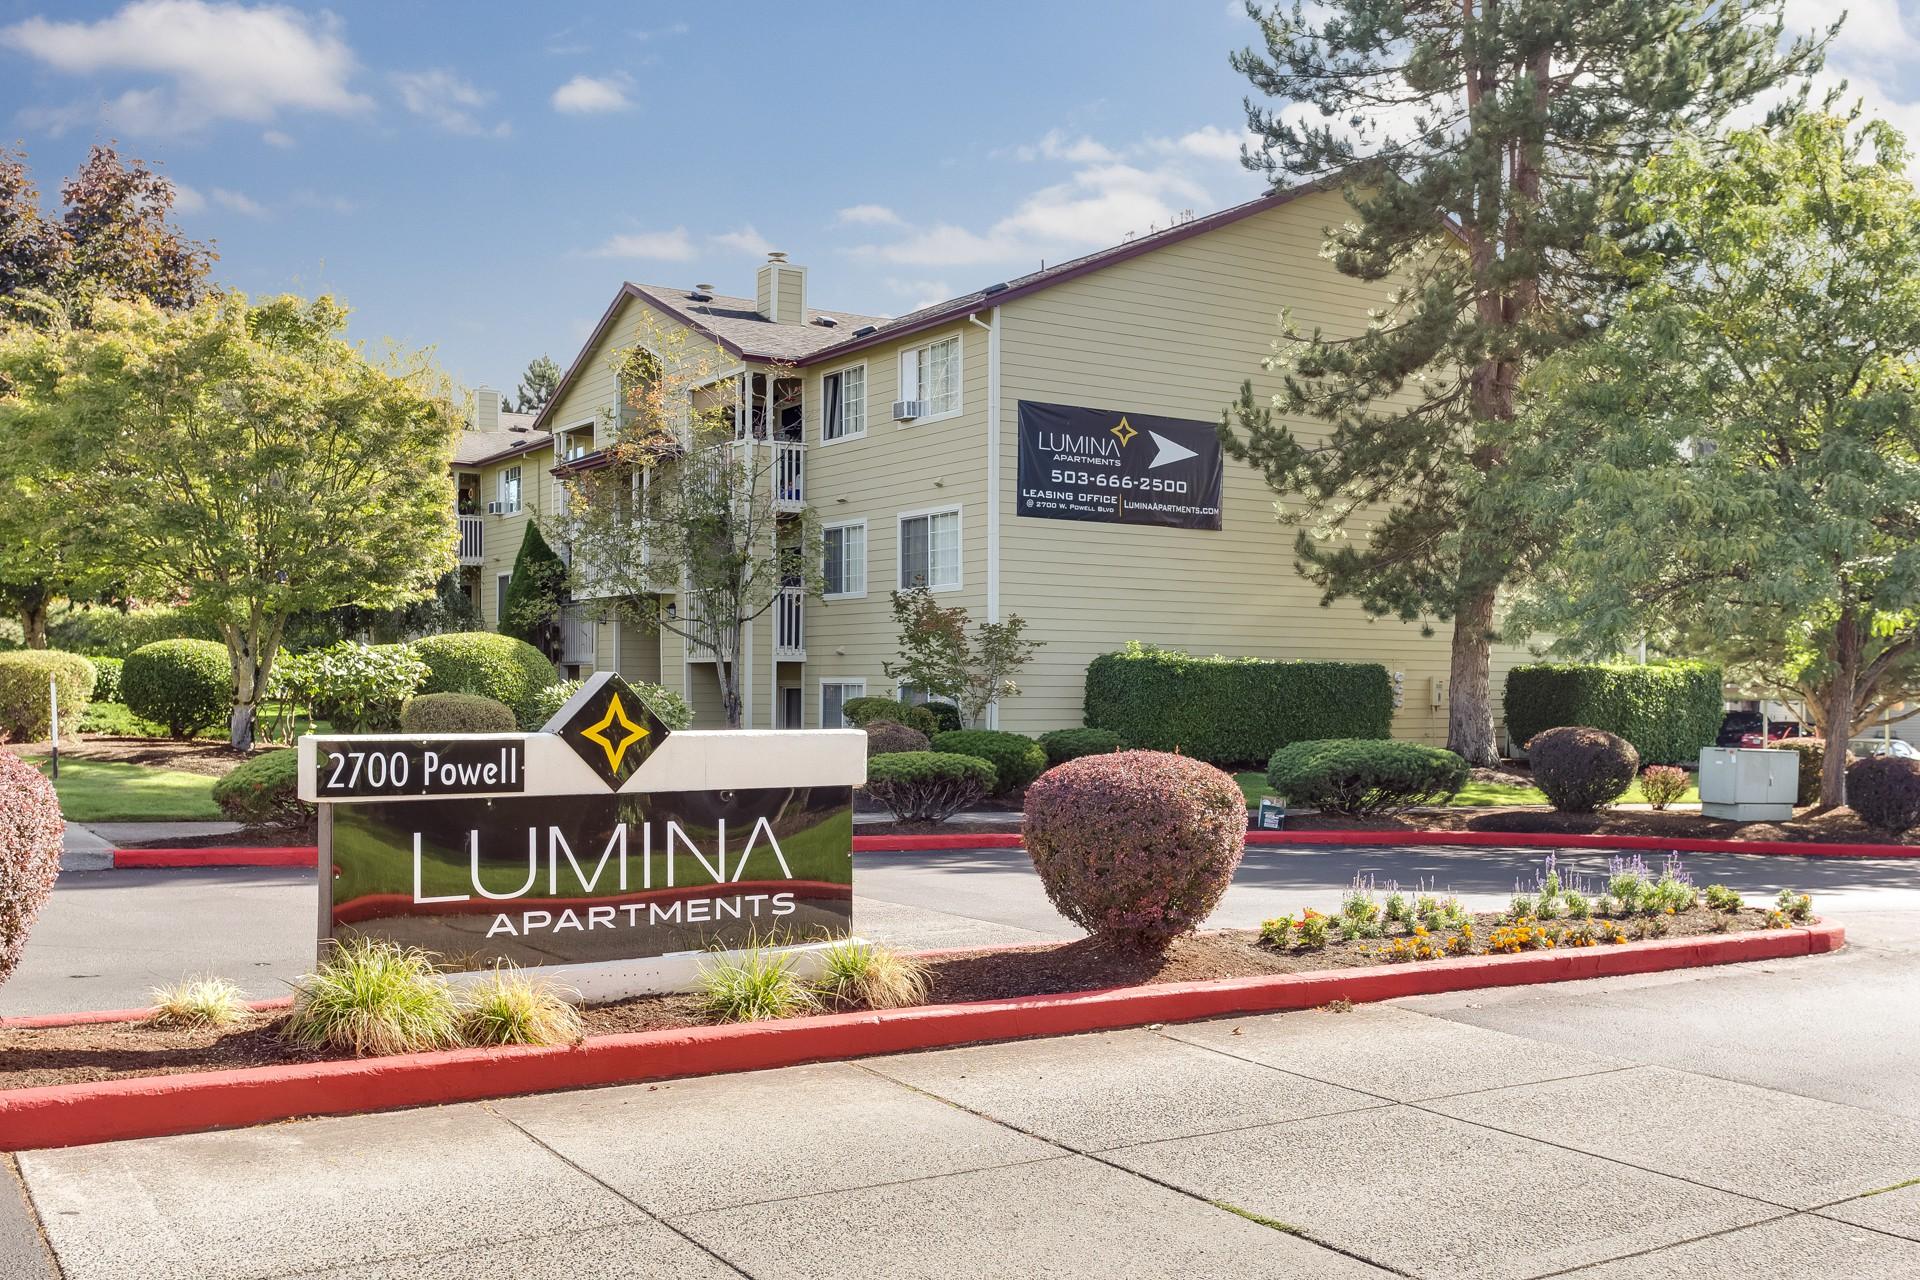 Lumina Apartments